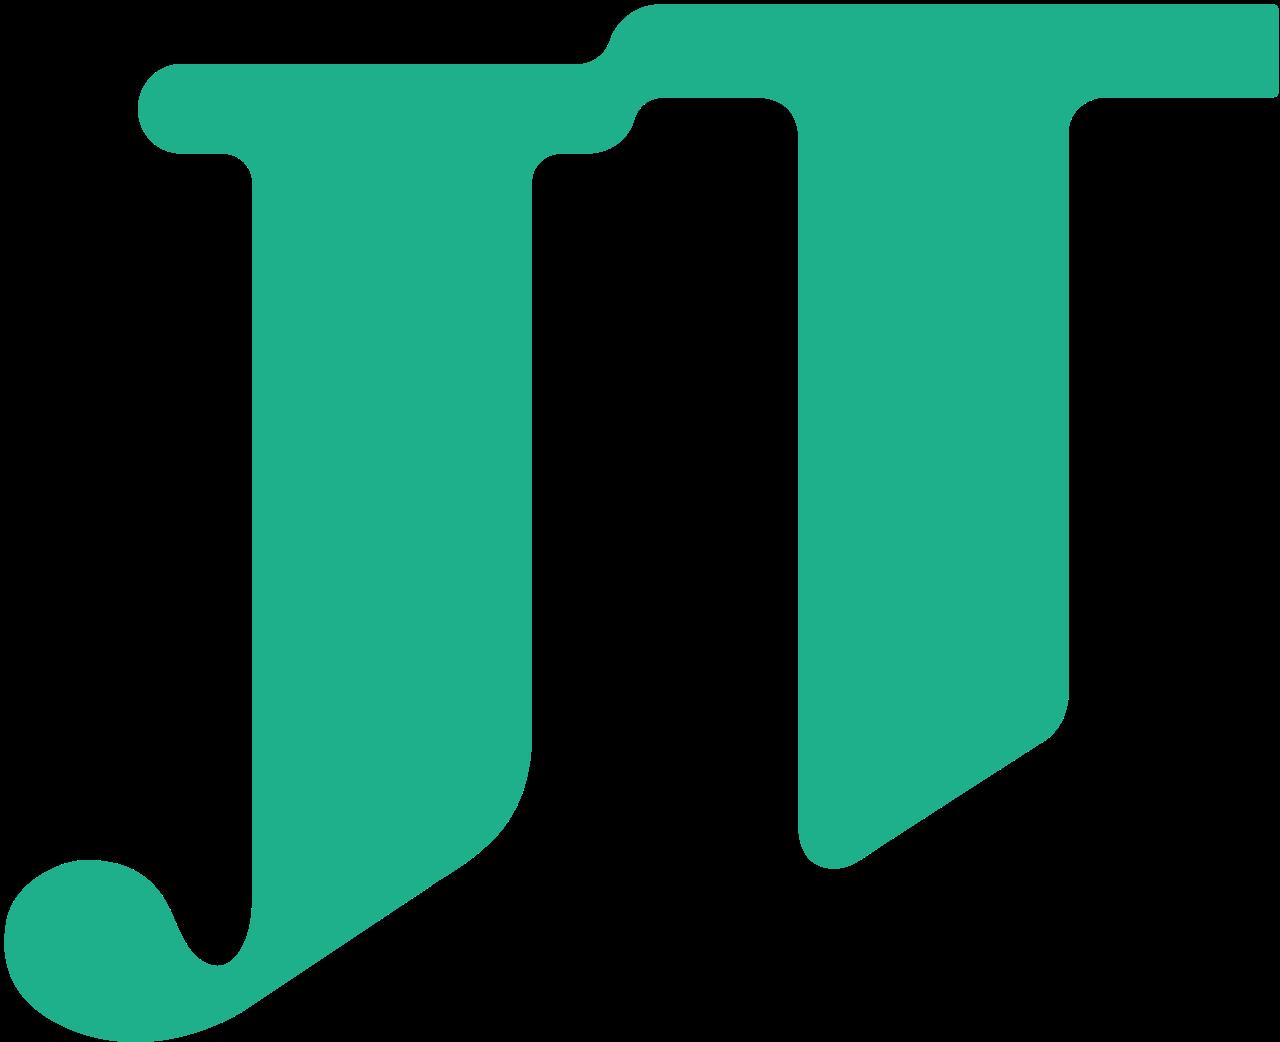 https://gt-min.s3.eu-central-1.amazonaws.com/1280px_Japan_Tobacco_logo_svg_894a7e6013.png